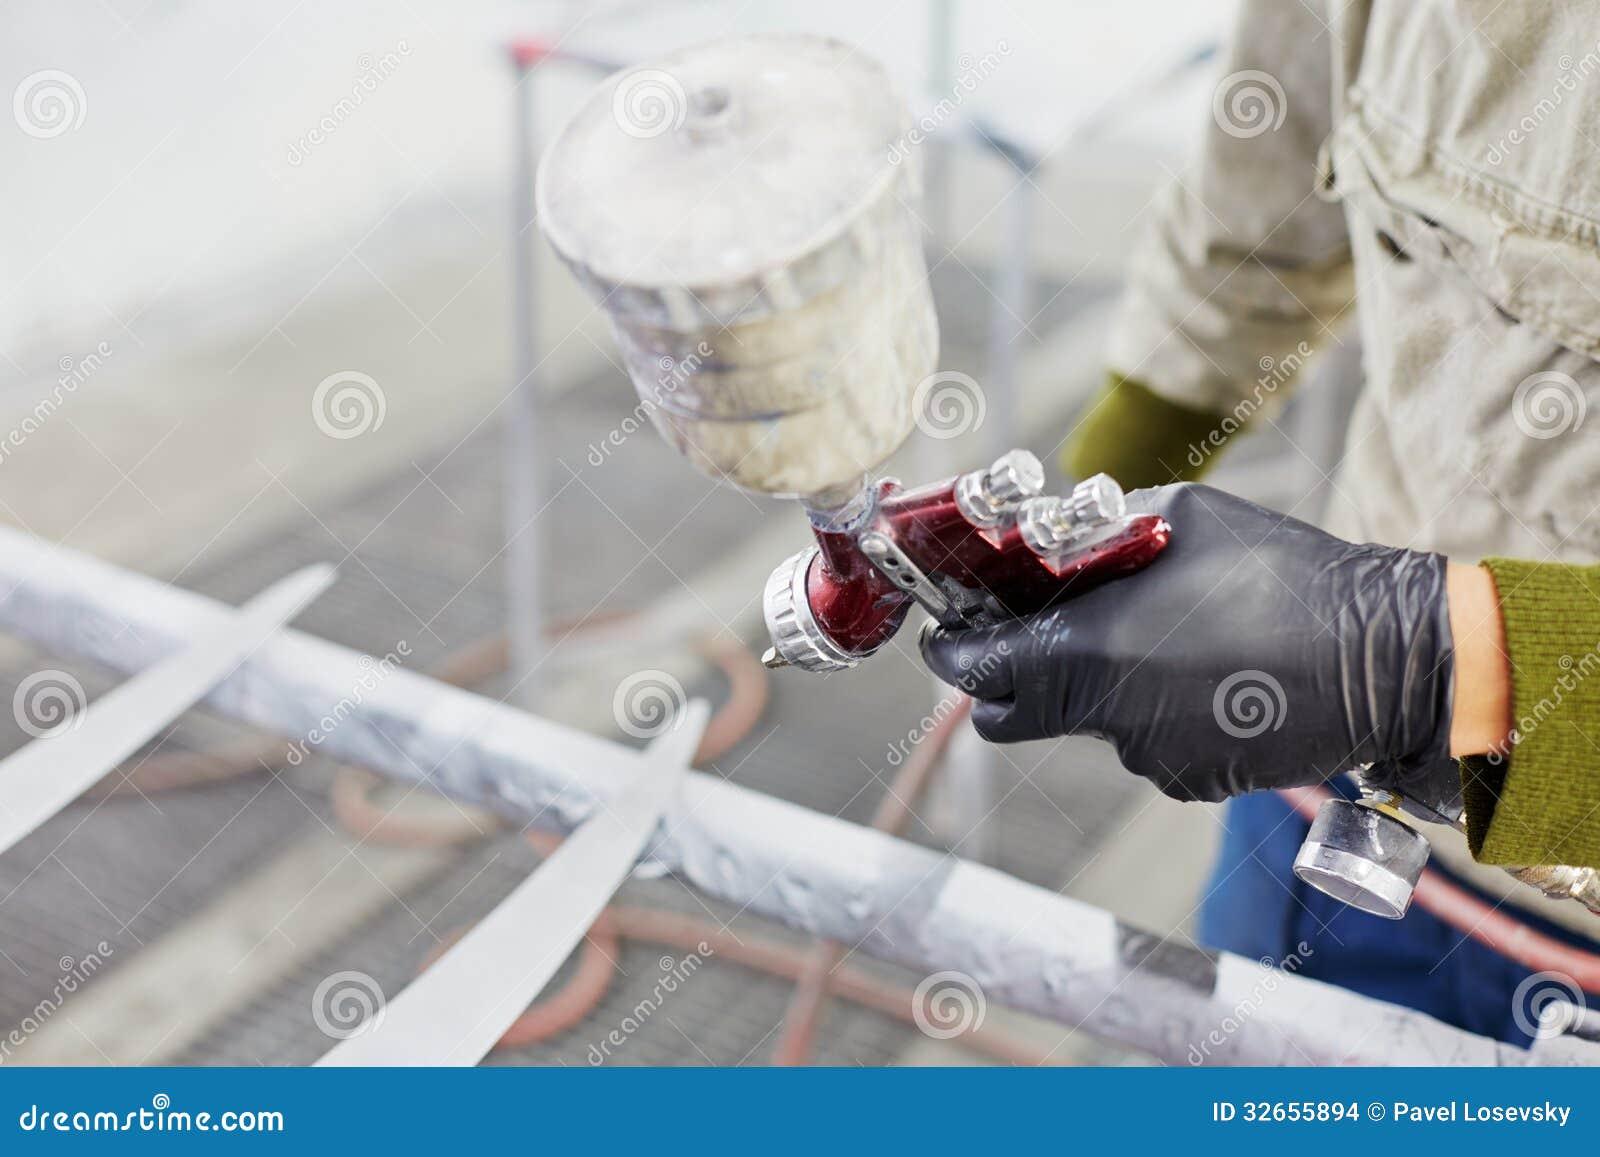 Spray Painting Glove Hand